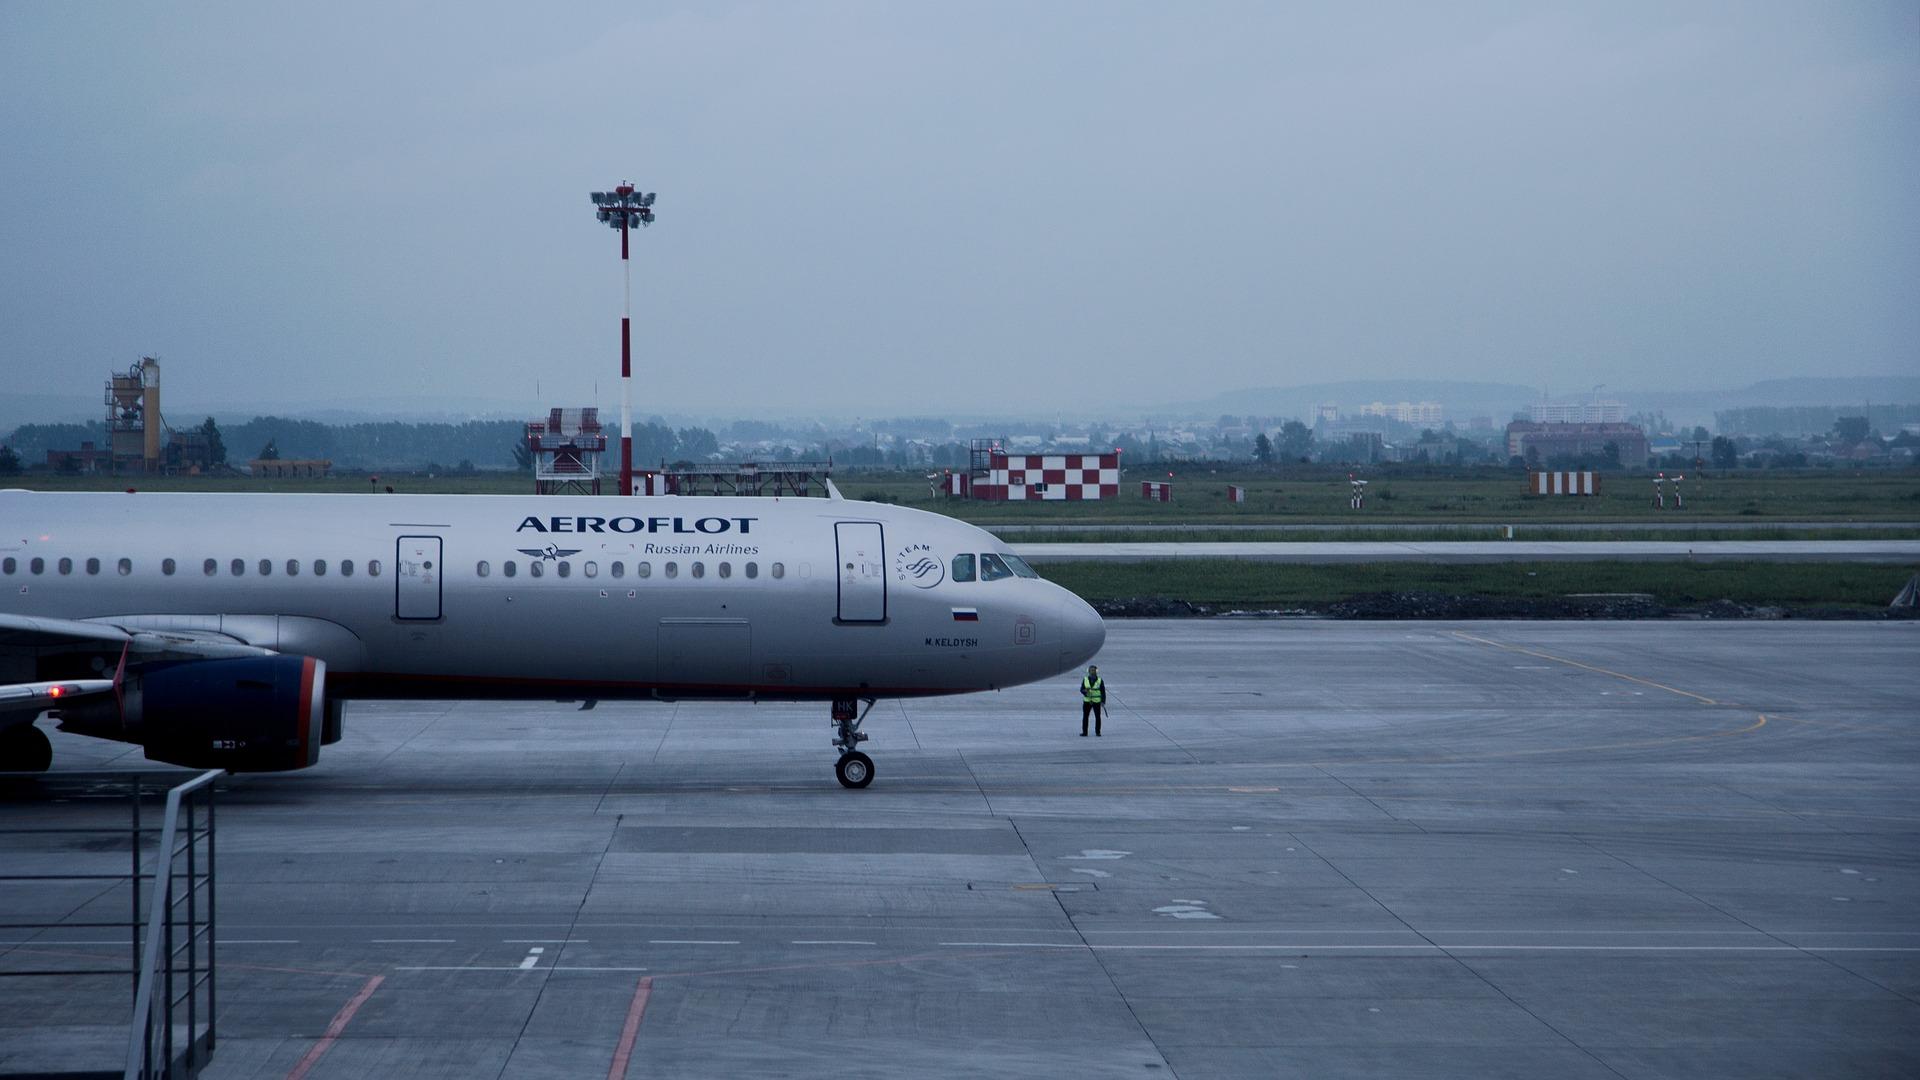 Aeroflot Moscow Russia